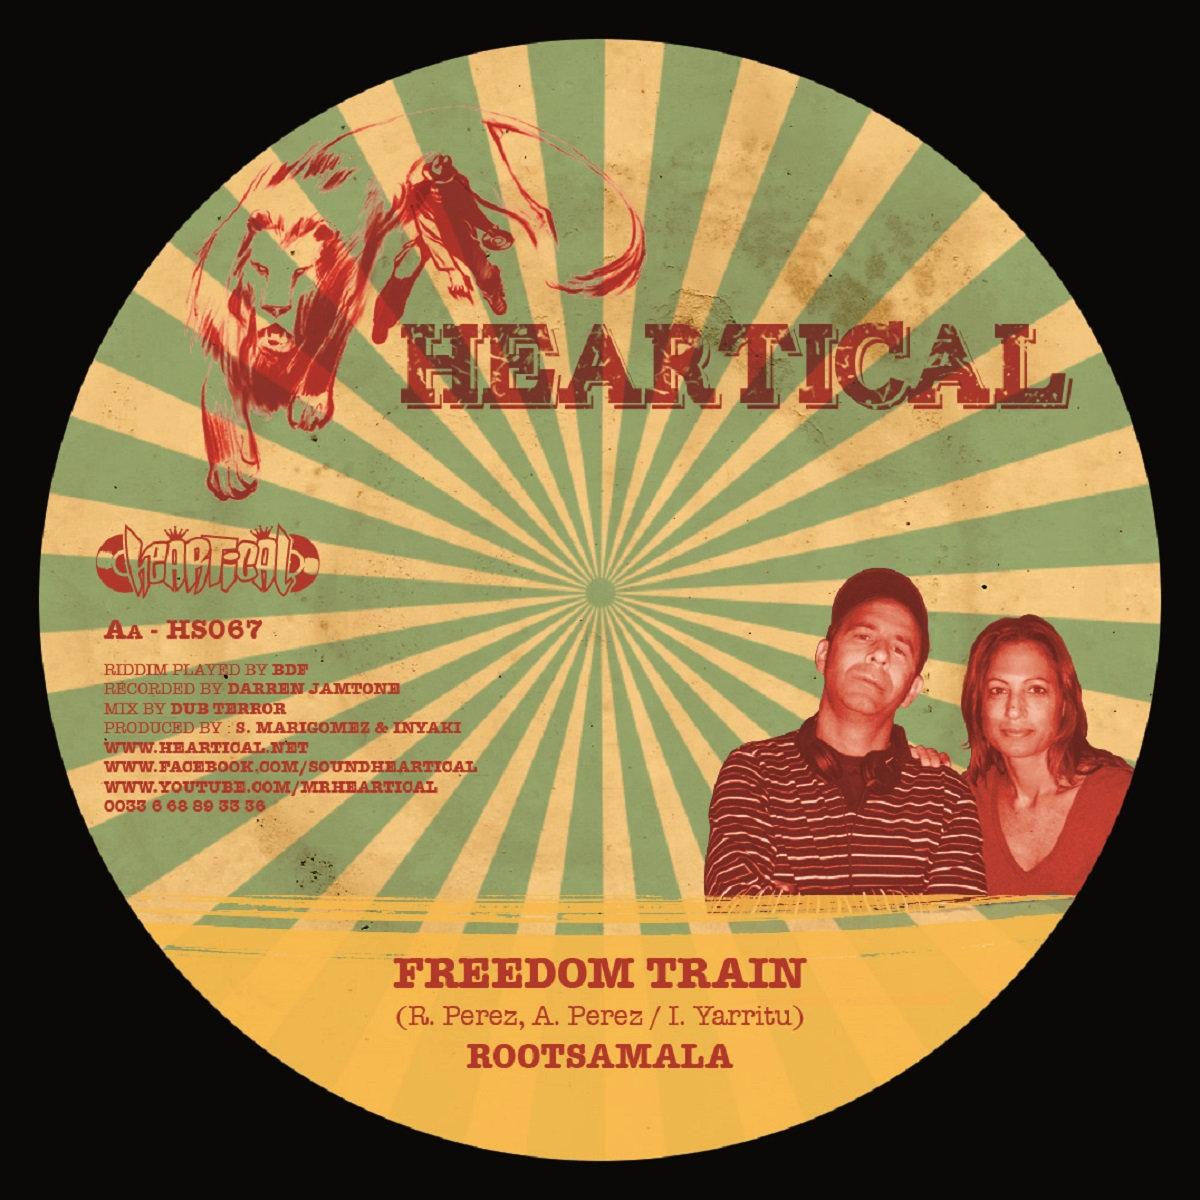 Freedom train rootsamala